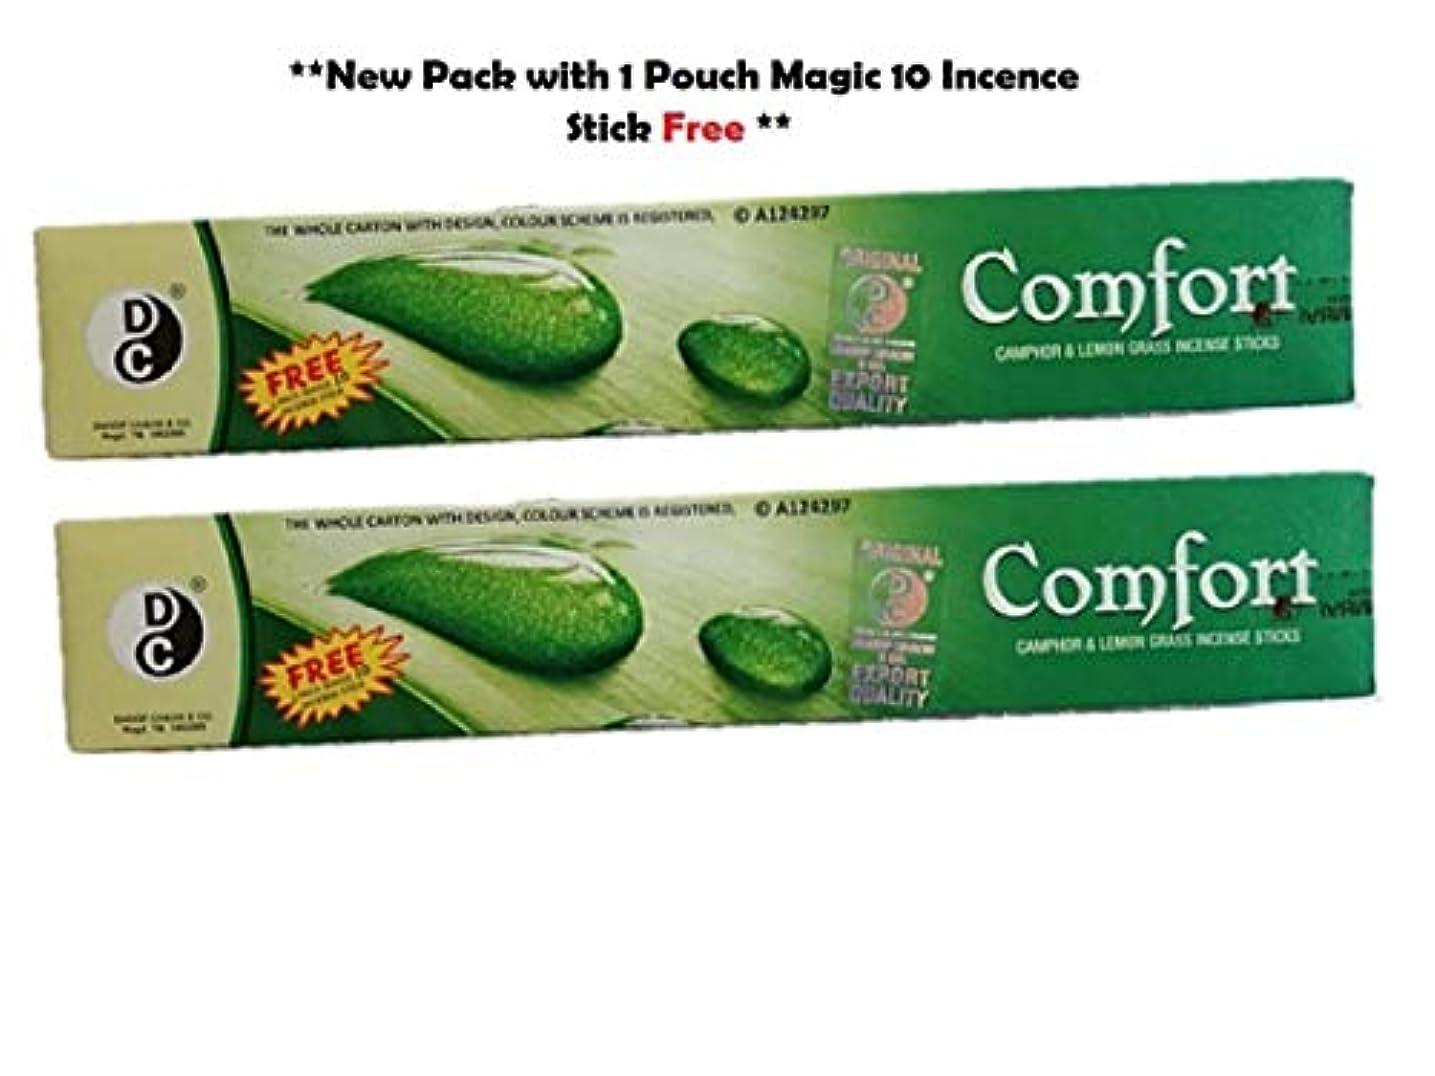 Comfort AC Natural Mosquito Repellent Camphor and Lemon Grass Incense Sticks (2 Boxes, 240 Sticks)